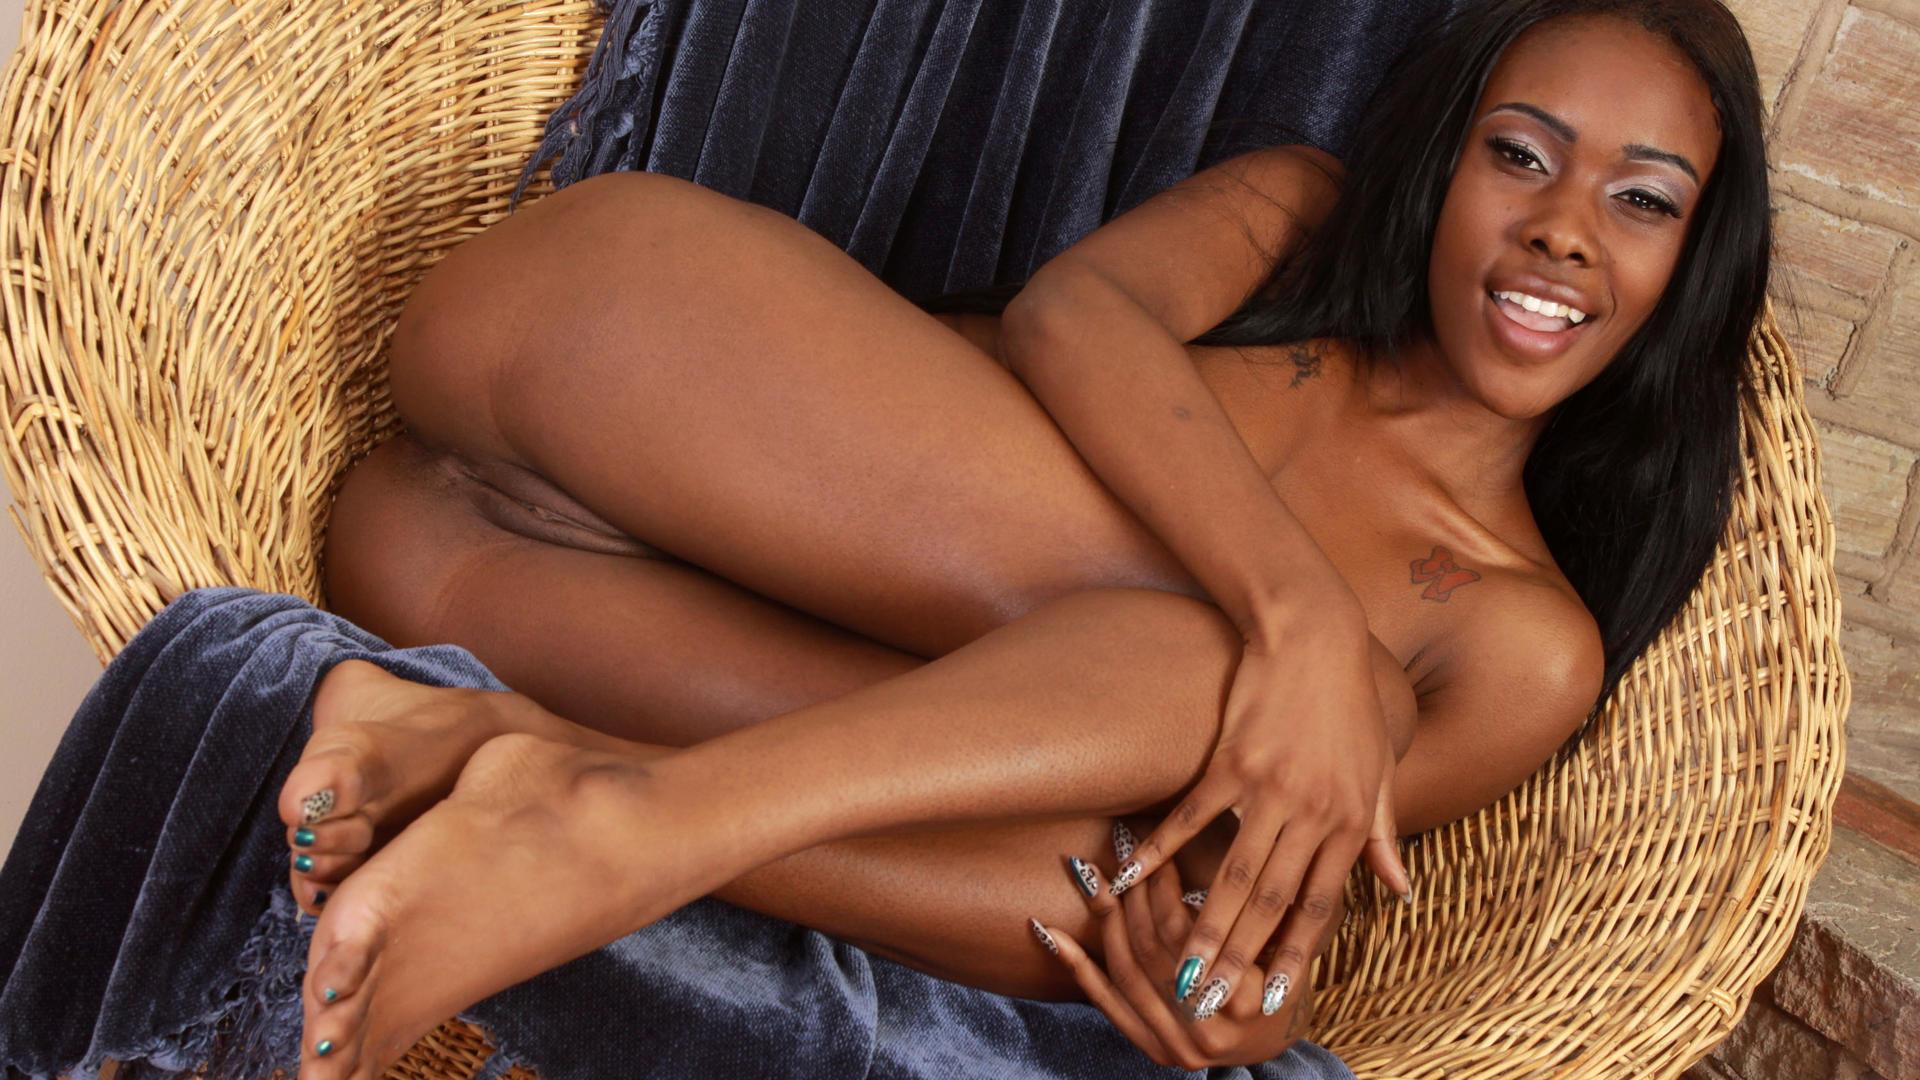 Nude Black Model Galleries Free Ebony